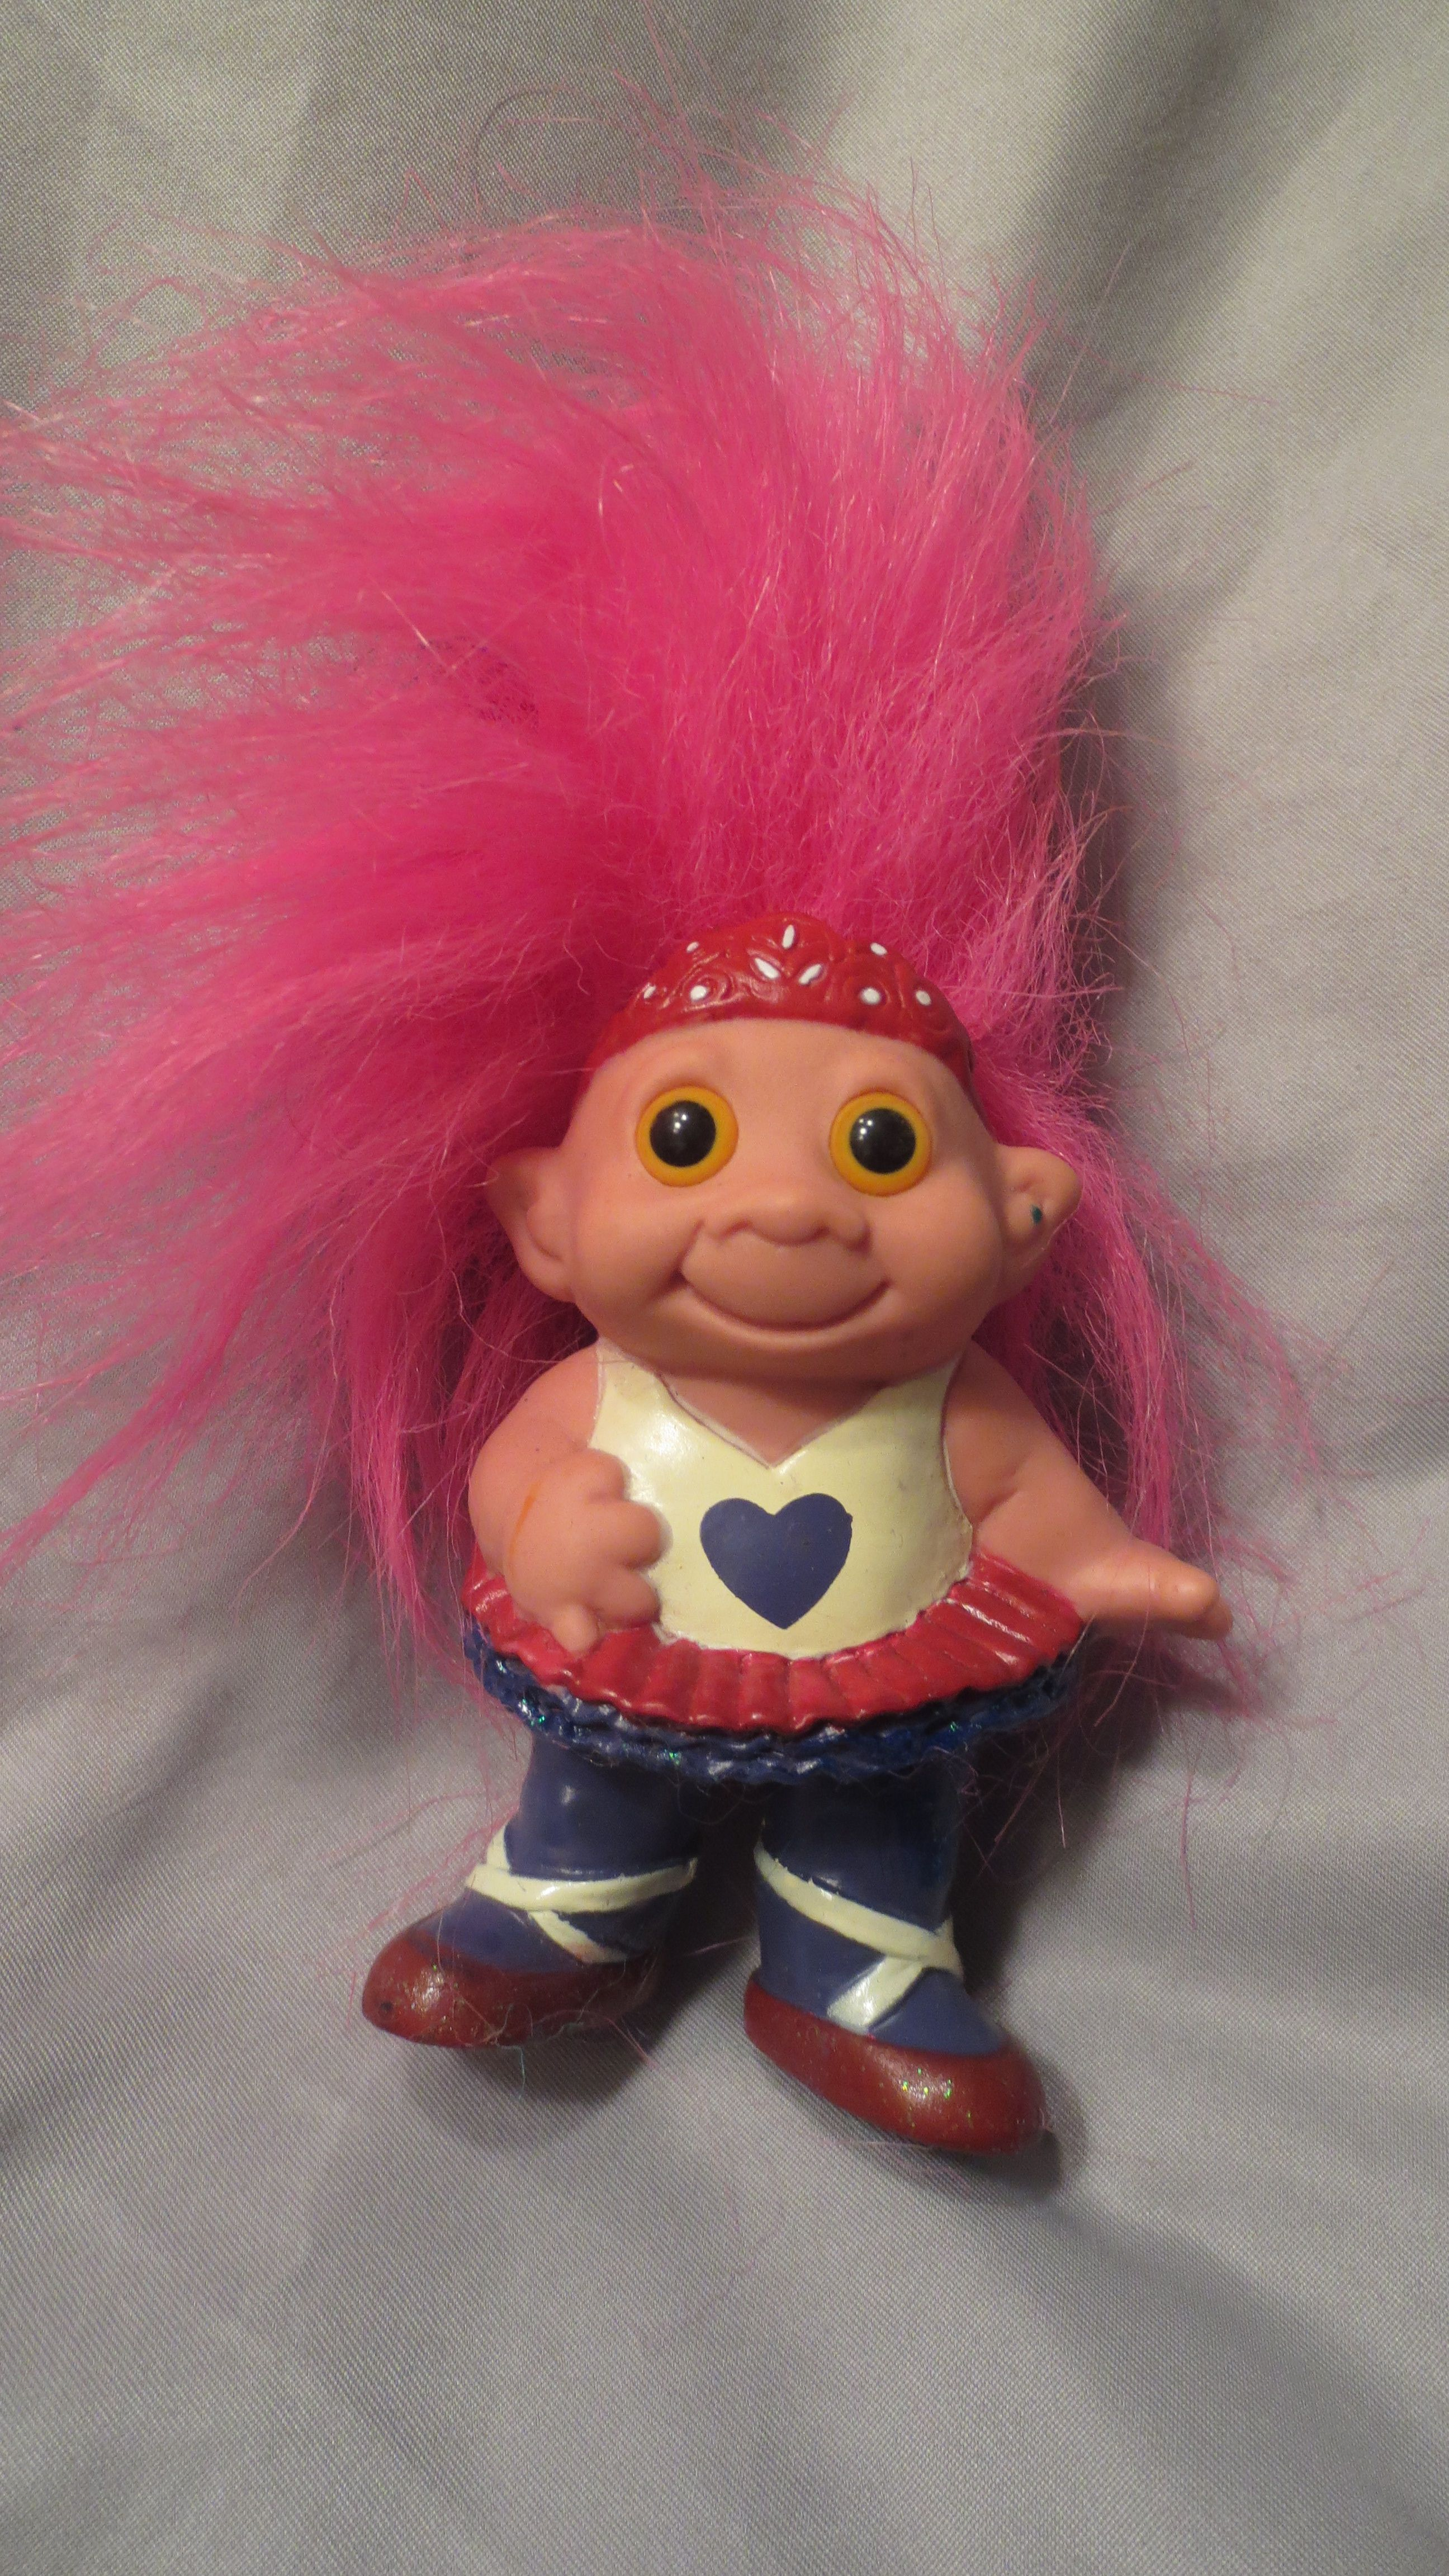 Pink Hair Dancer Disney Shows Girl With Pink Hair Disney Cartoons